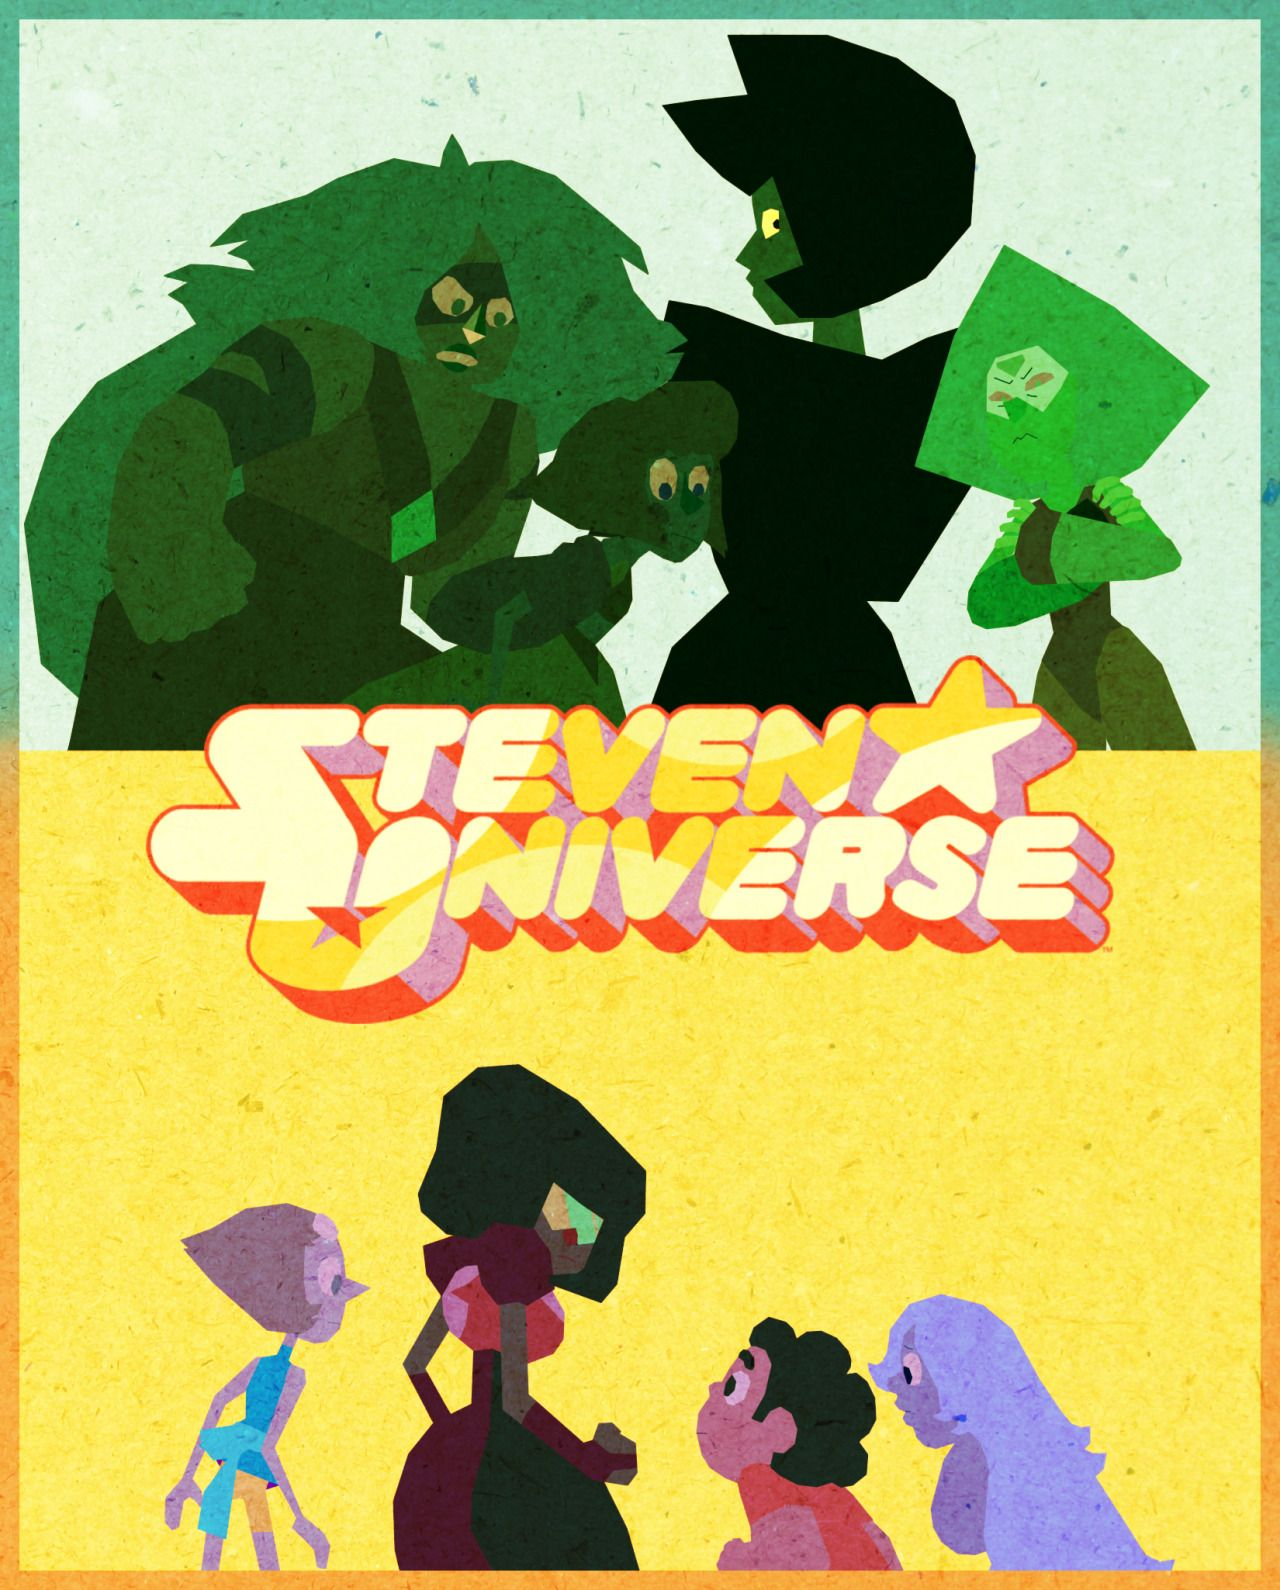 meme machine Photo Steven universe, Crystal gems